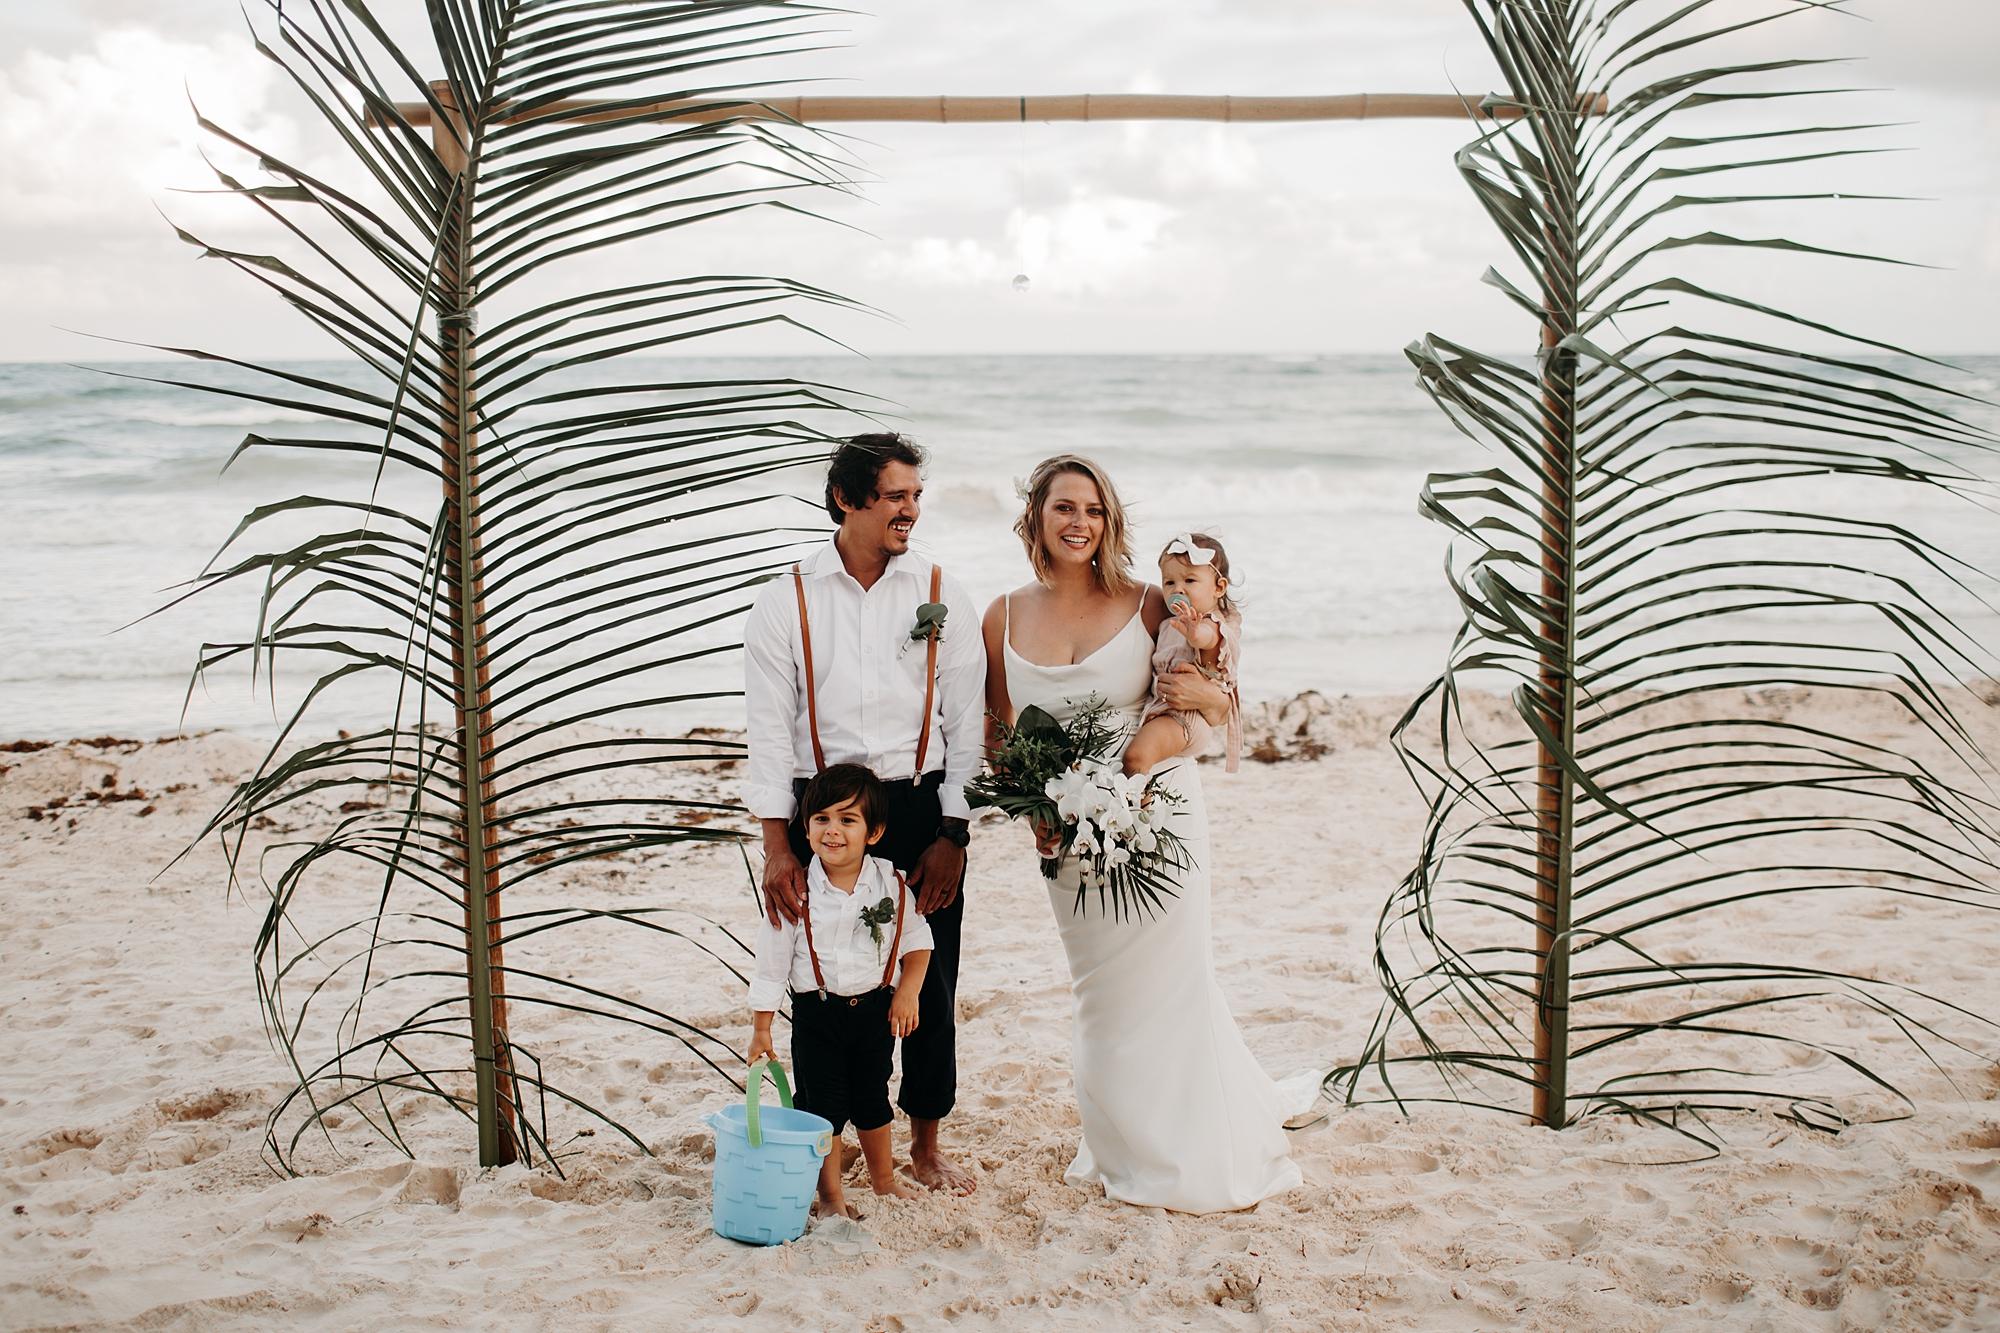 Danielle-San-Antonio-Wedding-Photographer-209_WEB.jpg